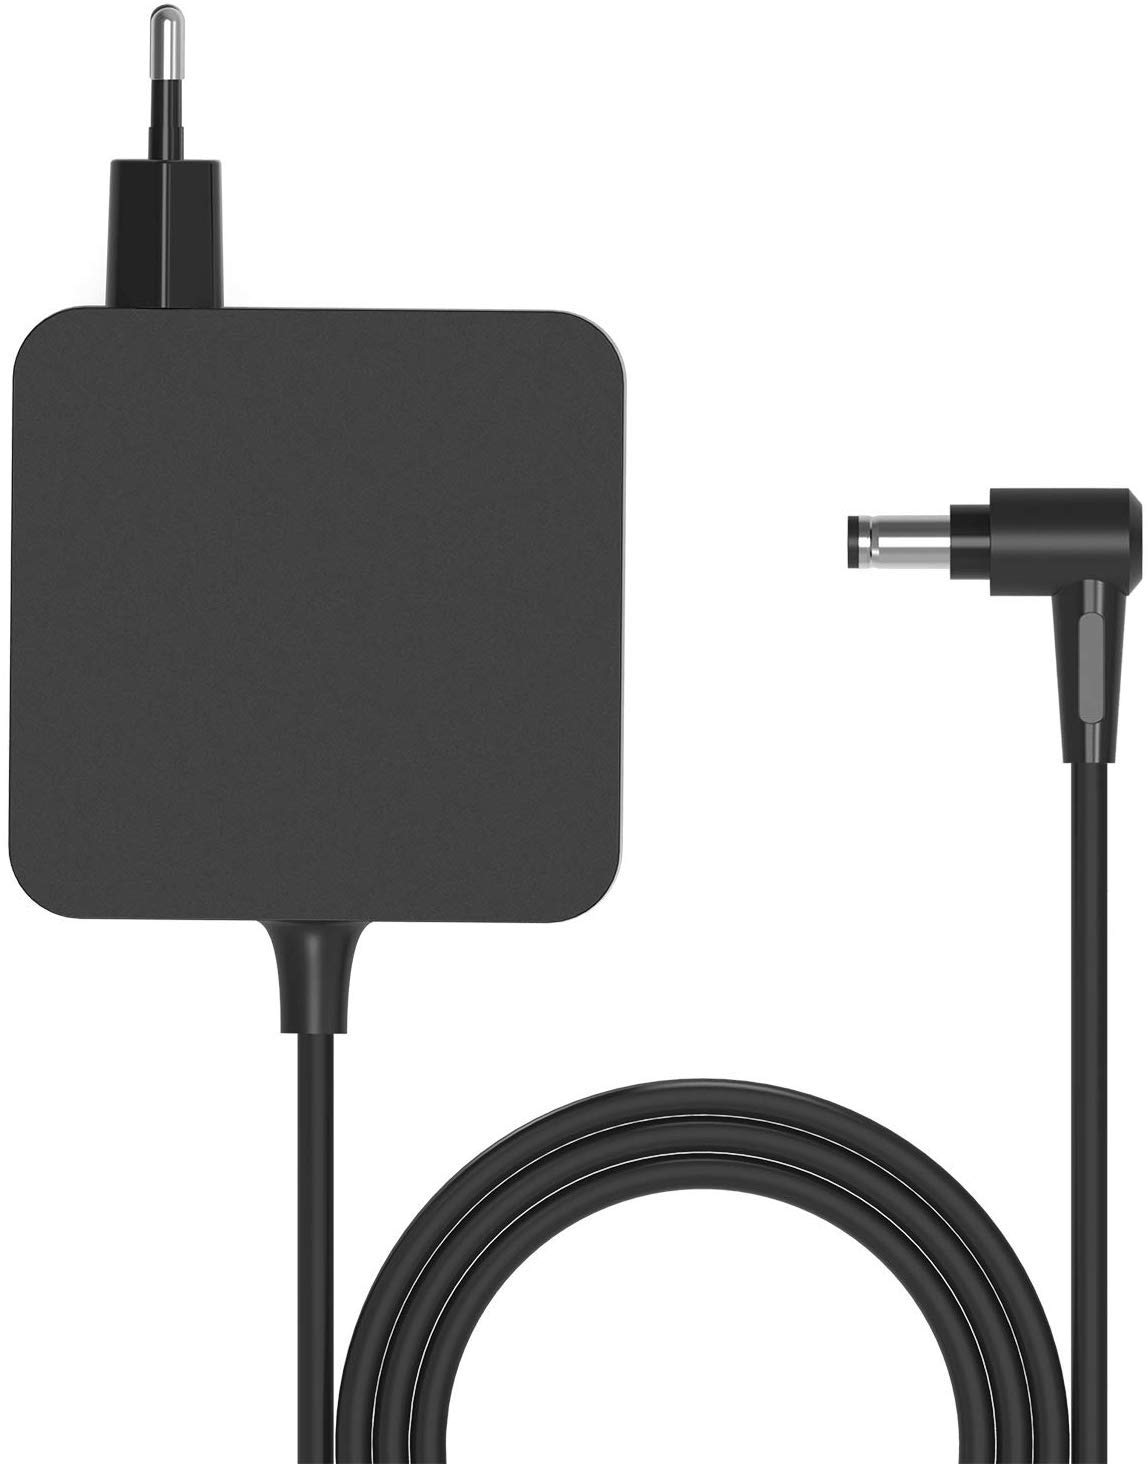 Atopoo Cargador para computadora port/átil 20V 2.25A 45W Reemplazo del Adaptador de Corriente con Lenovo IdeaPad 100110110110-Touch 320s 520s Yoga 310 520 B50-50 V110-17 N22 N42 UK Wall Plug 4.0 1.7